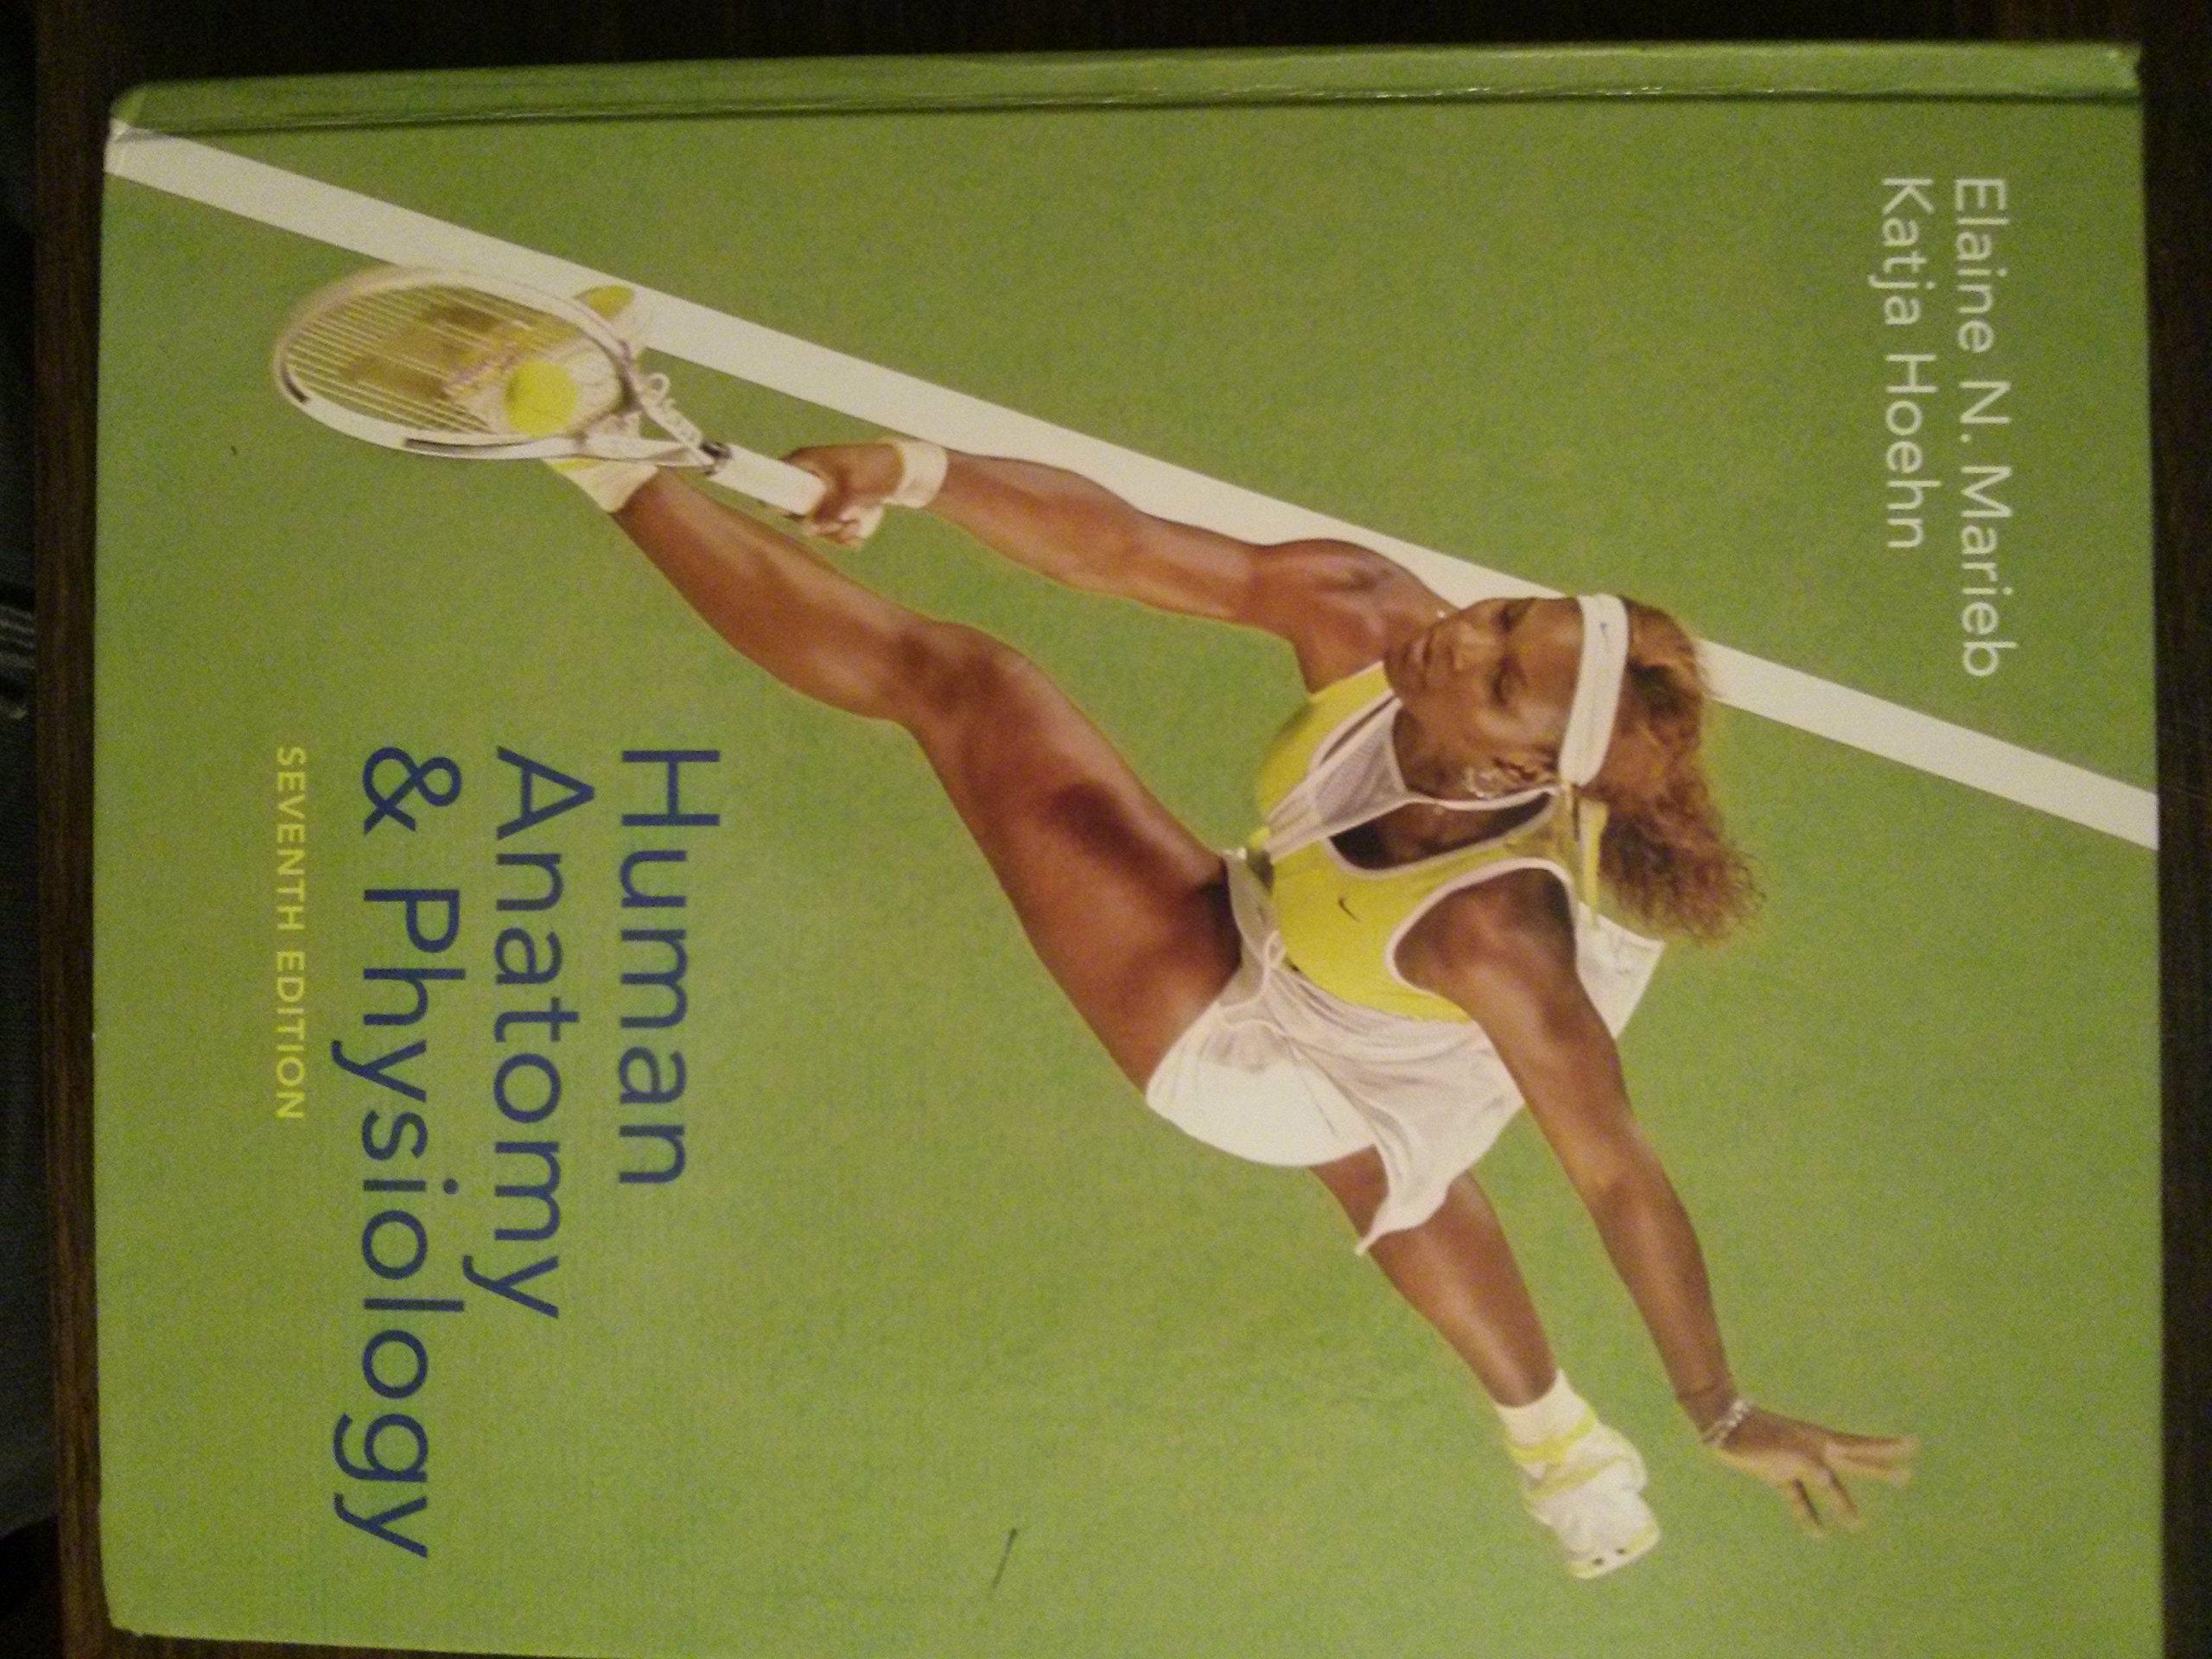 Essentials of Human Anatomy And Physiology: Amazon.co.uk: Elaine ...